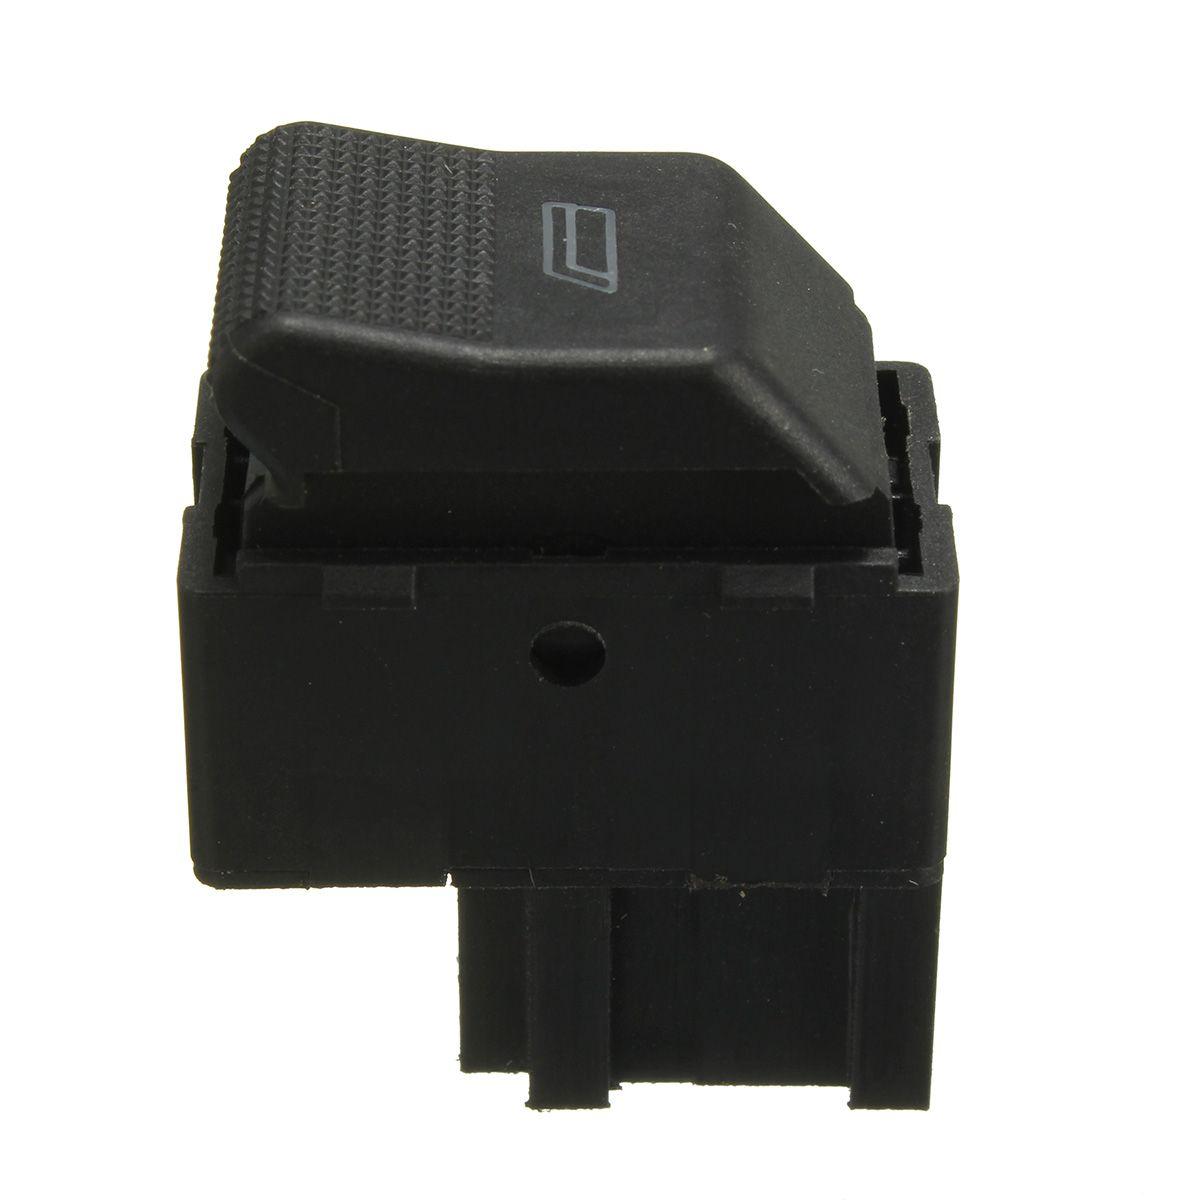 1 Stücke Universal Black Elektrische Fensterheber Für Vw Polo Lupo 6N2 Seat Cordoba 6X0959855B